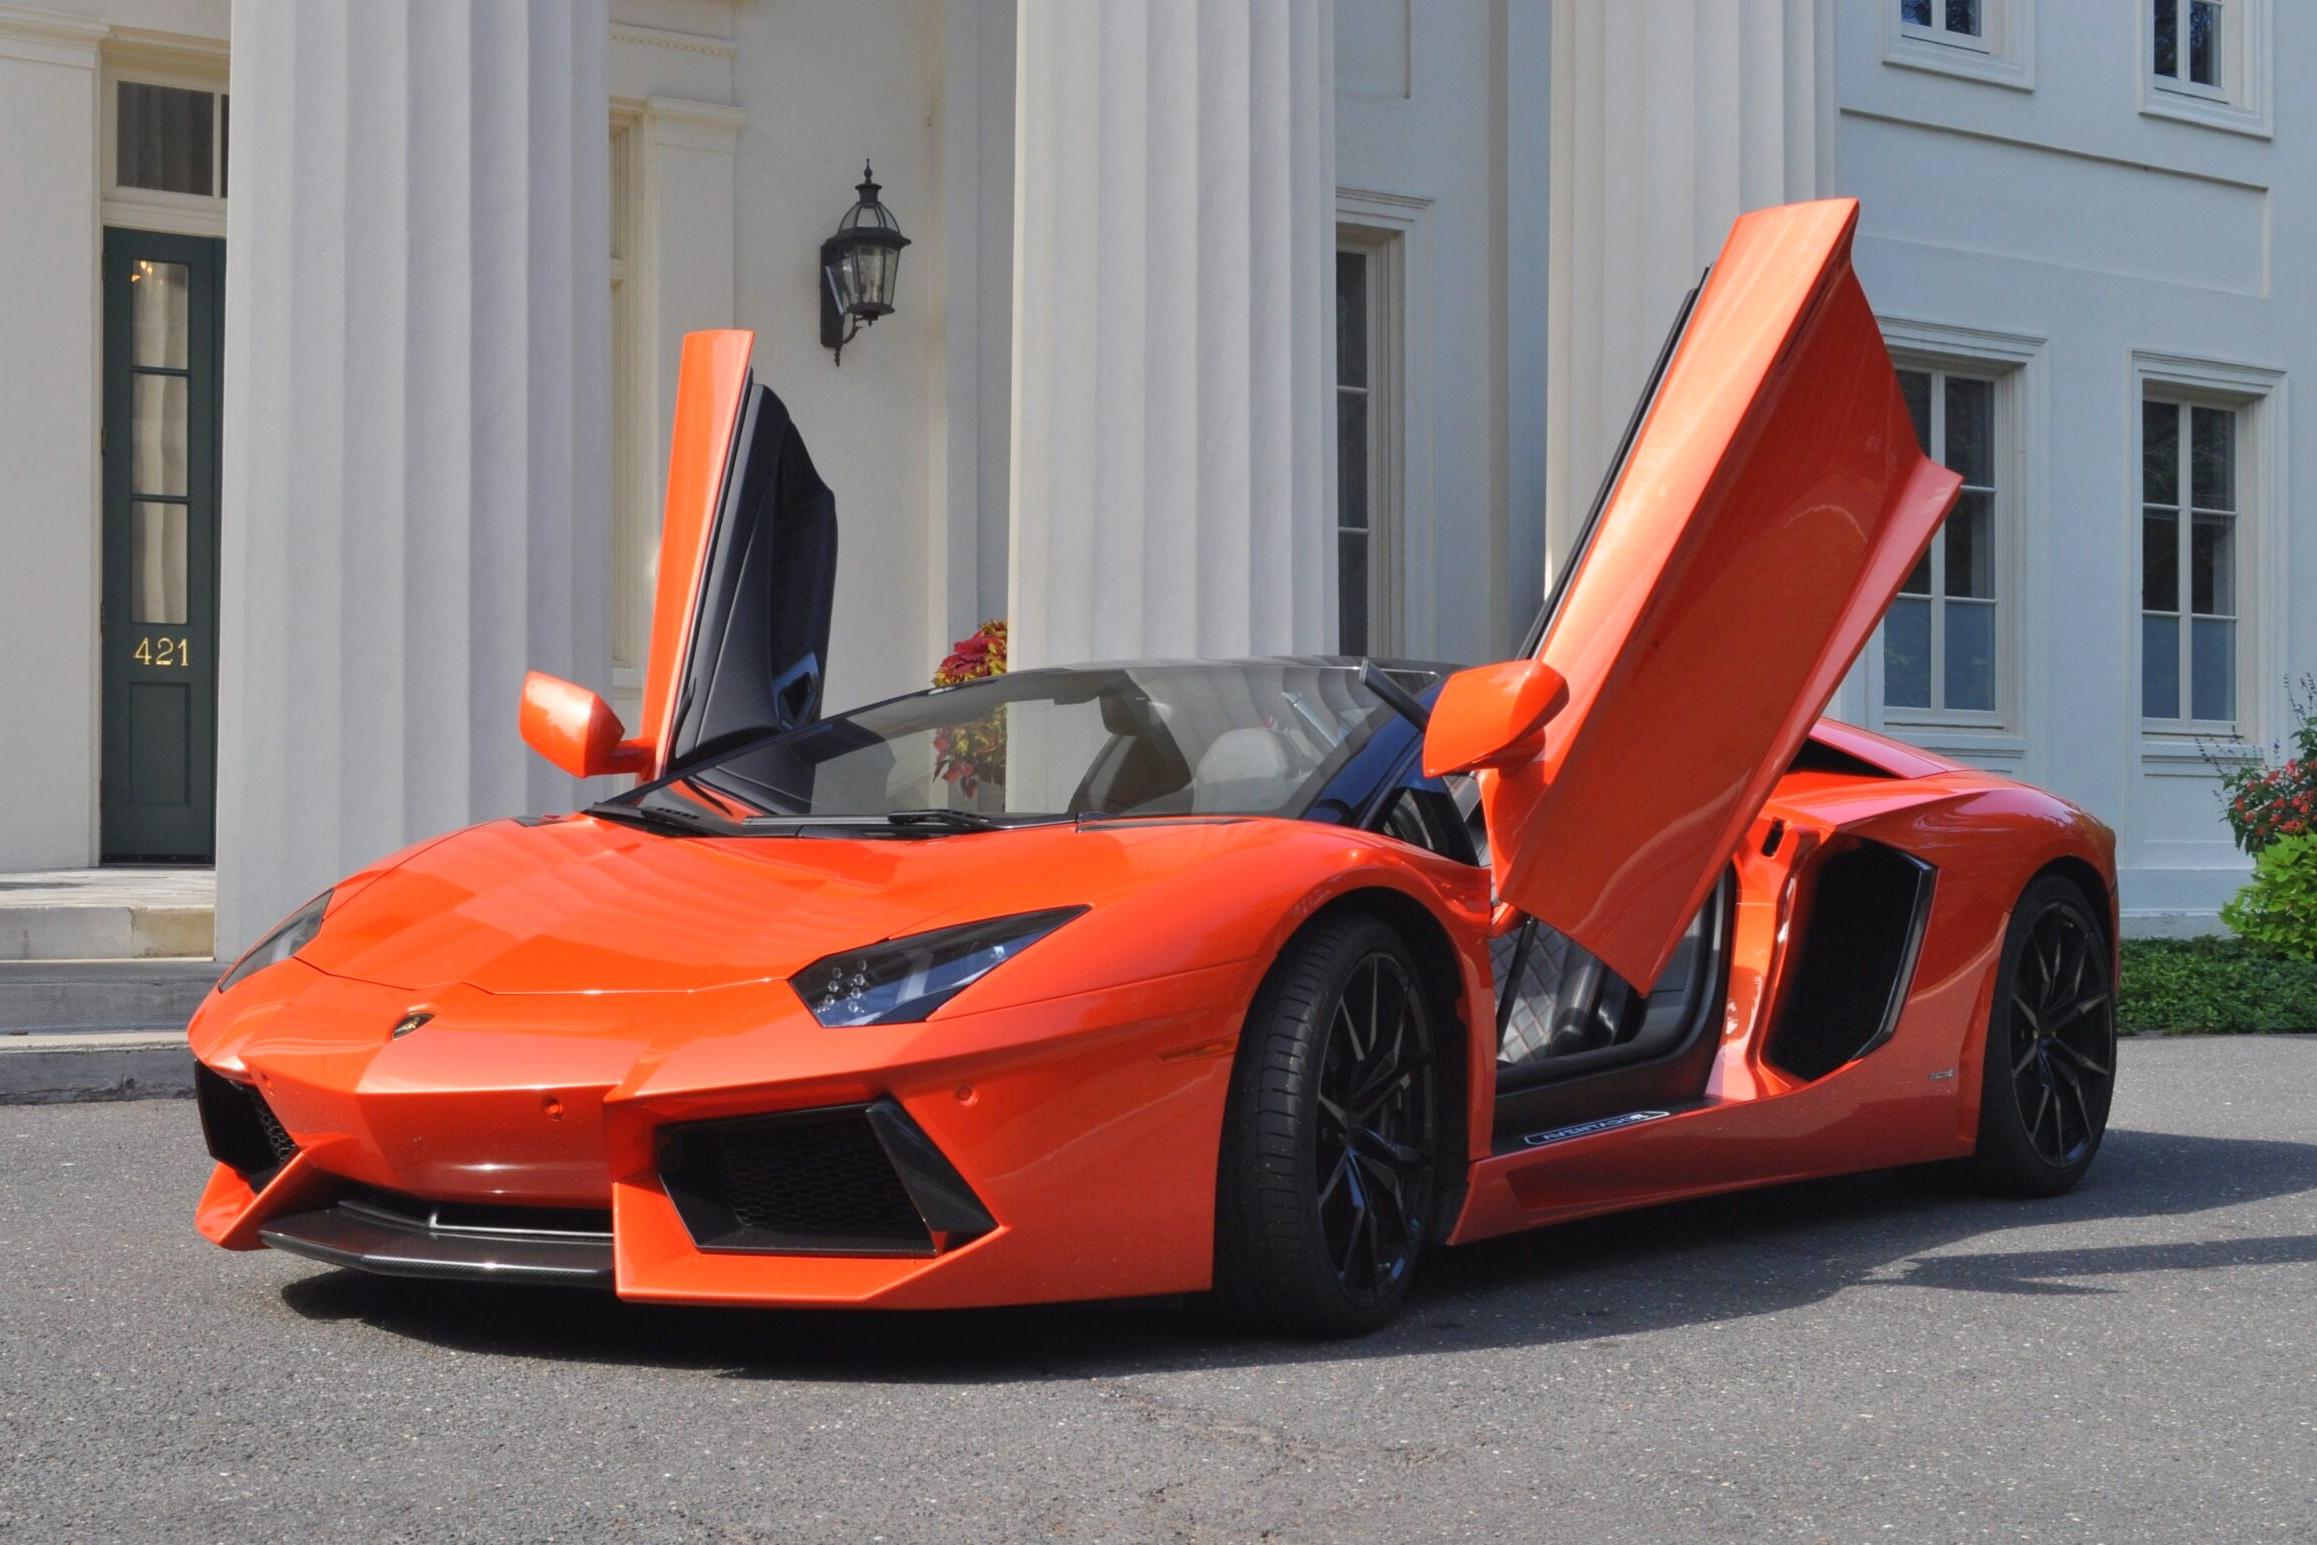 thanh nien tuyet thuc mua Lamborghini anh 1